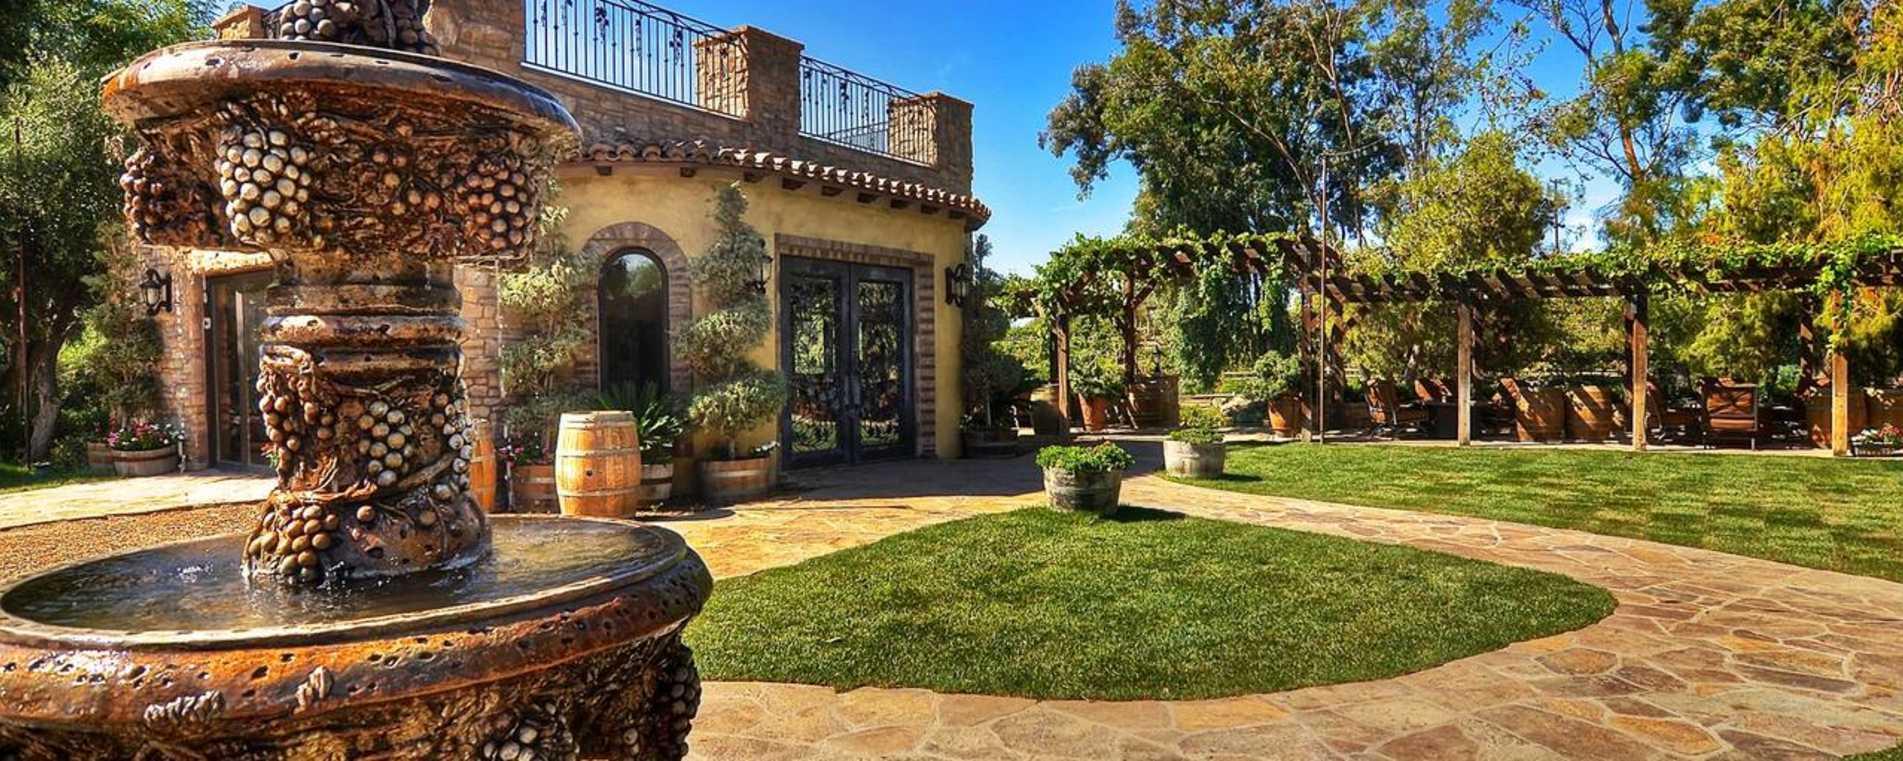 Vitagliano Vineyards & Winery - Temecula